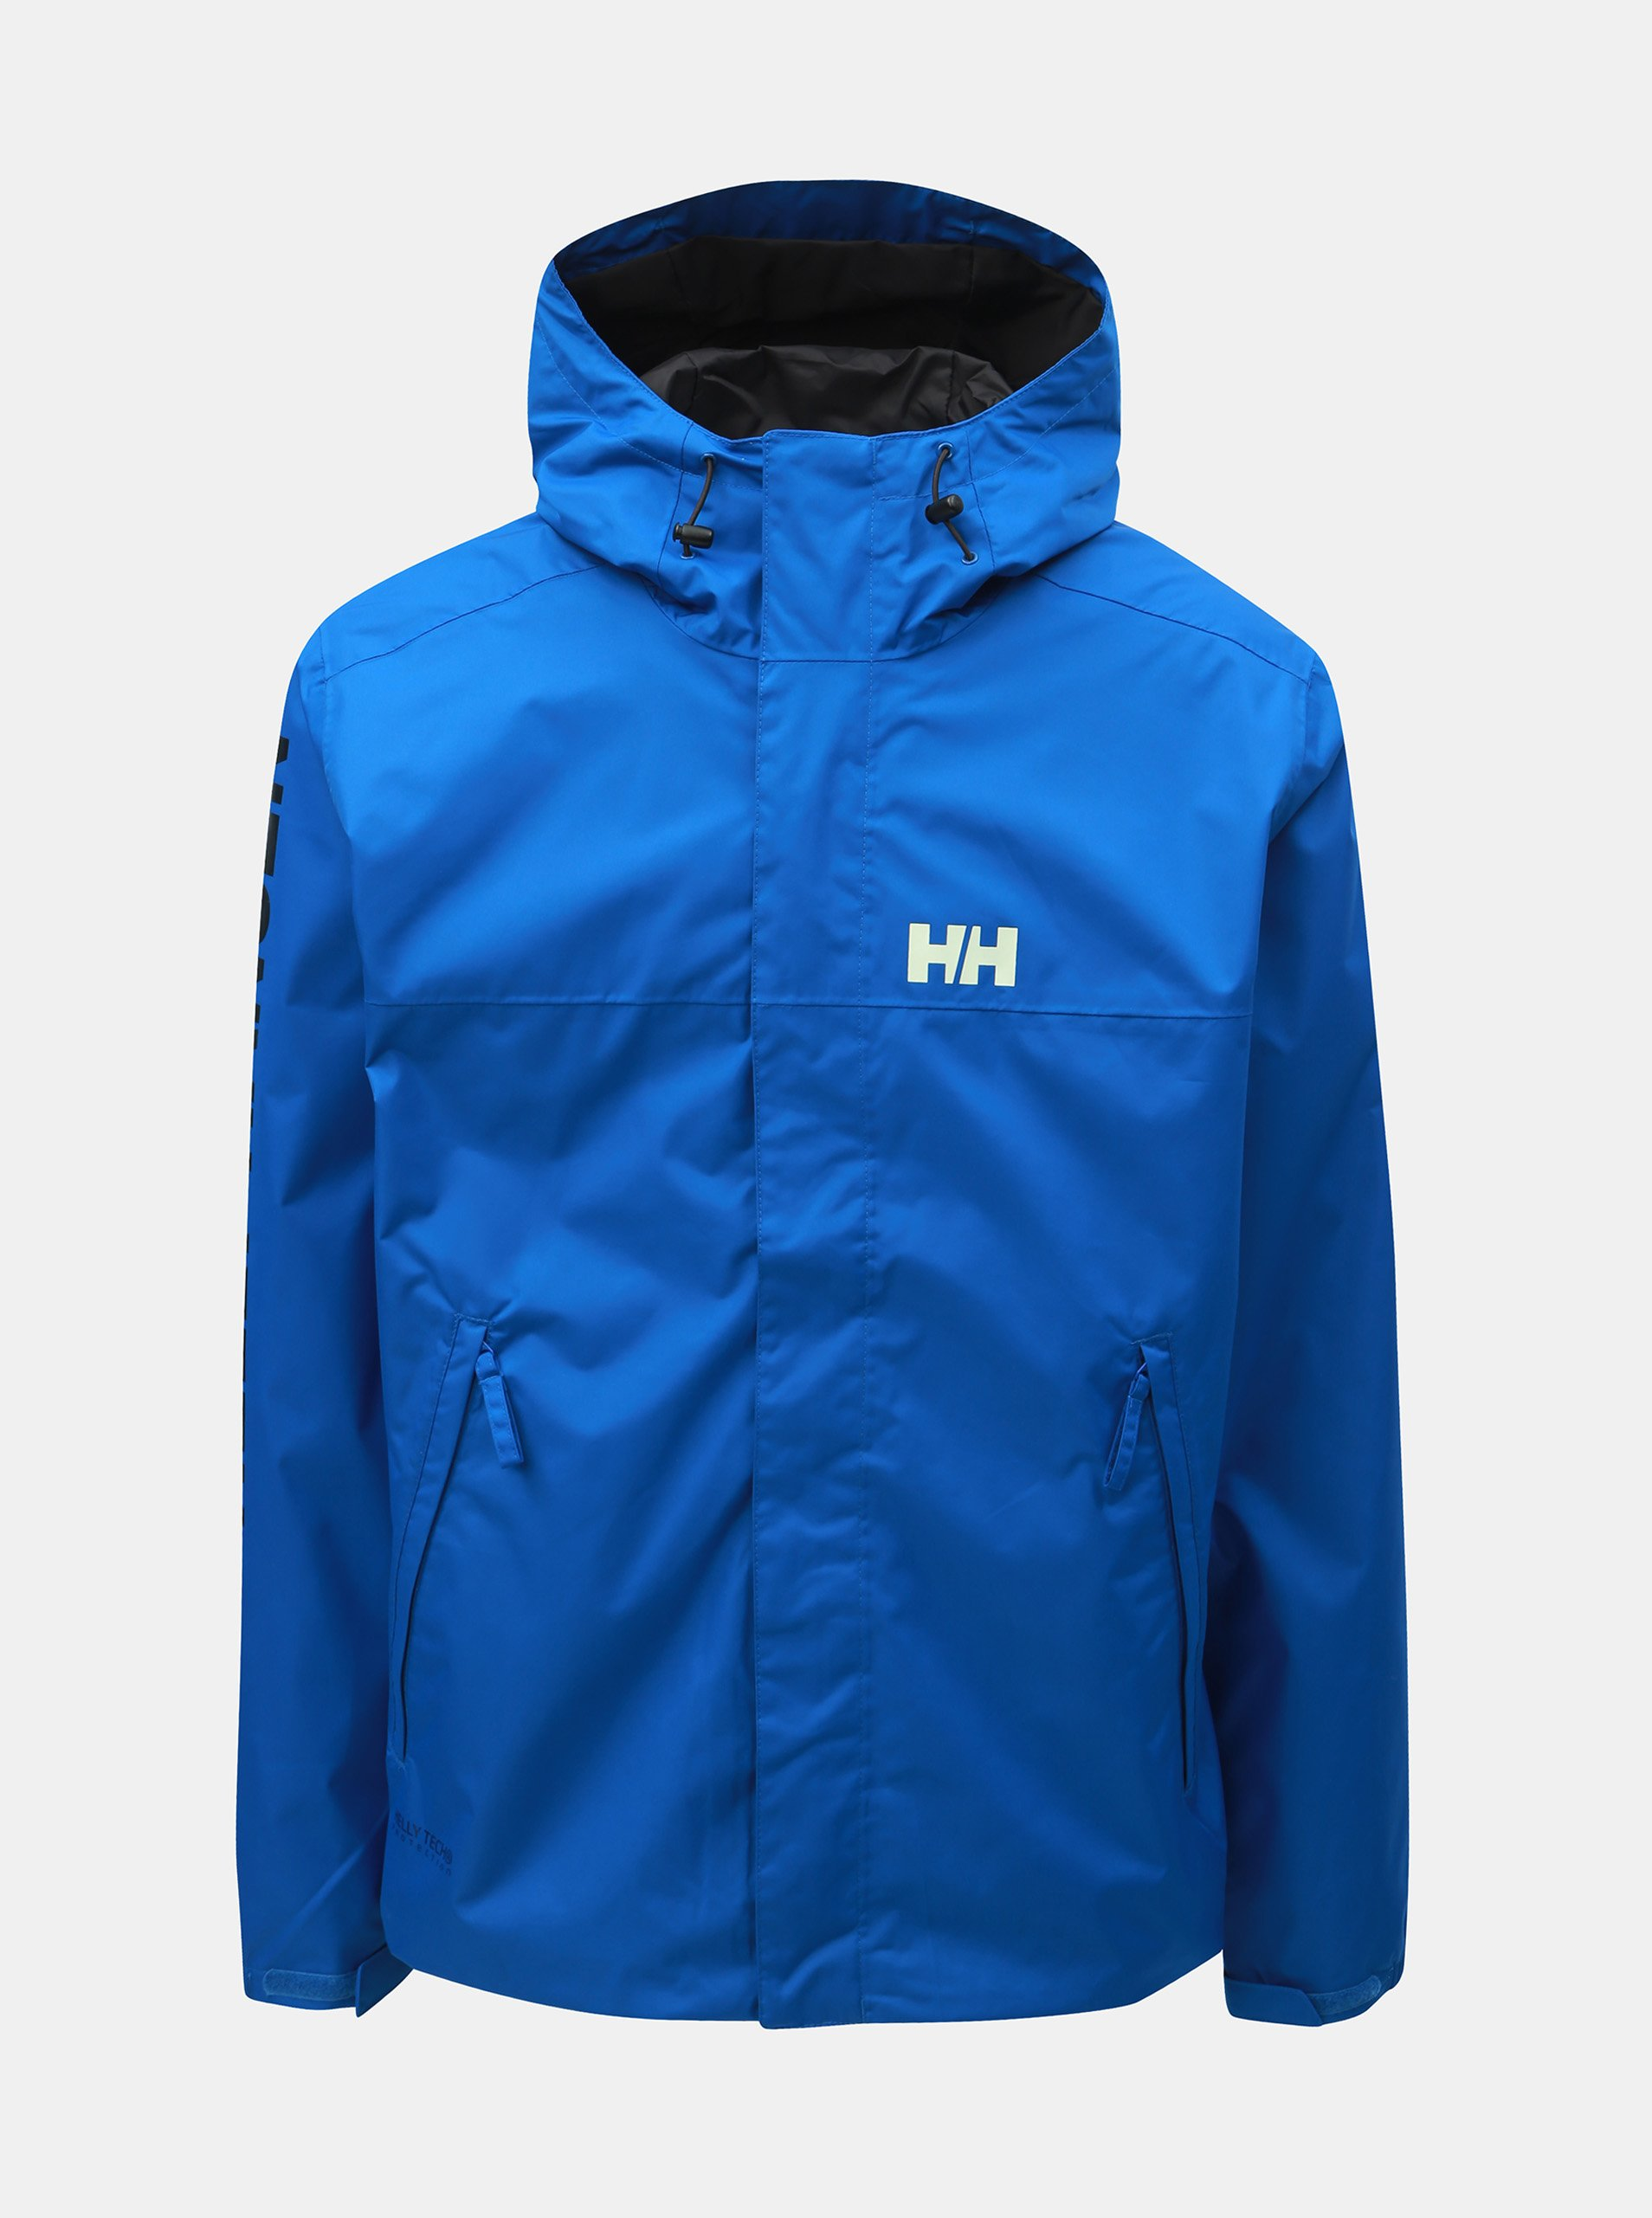 Fotografie Modrá pánská nepromokavá lehká bunda HELLY HANSEN